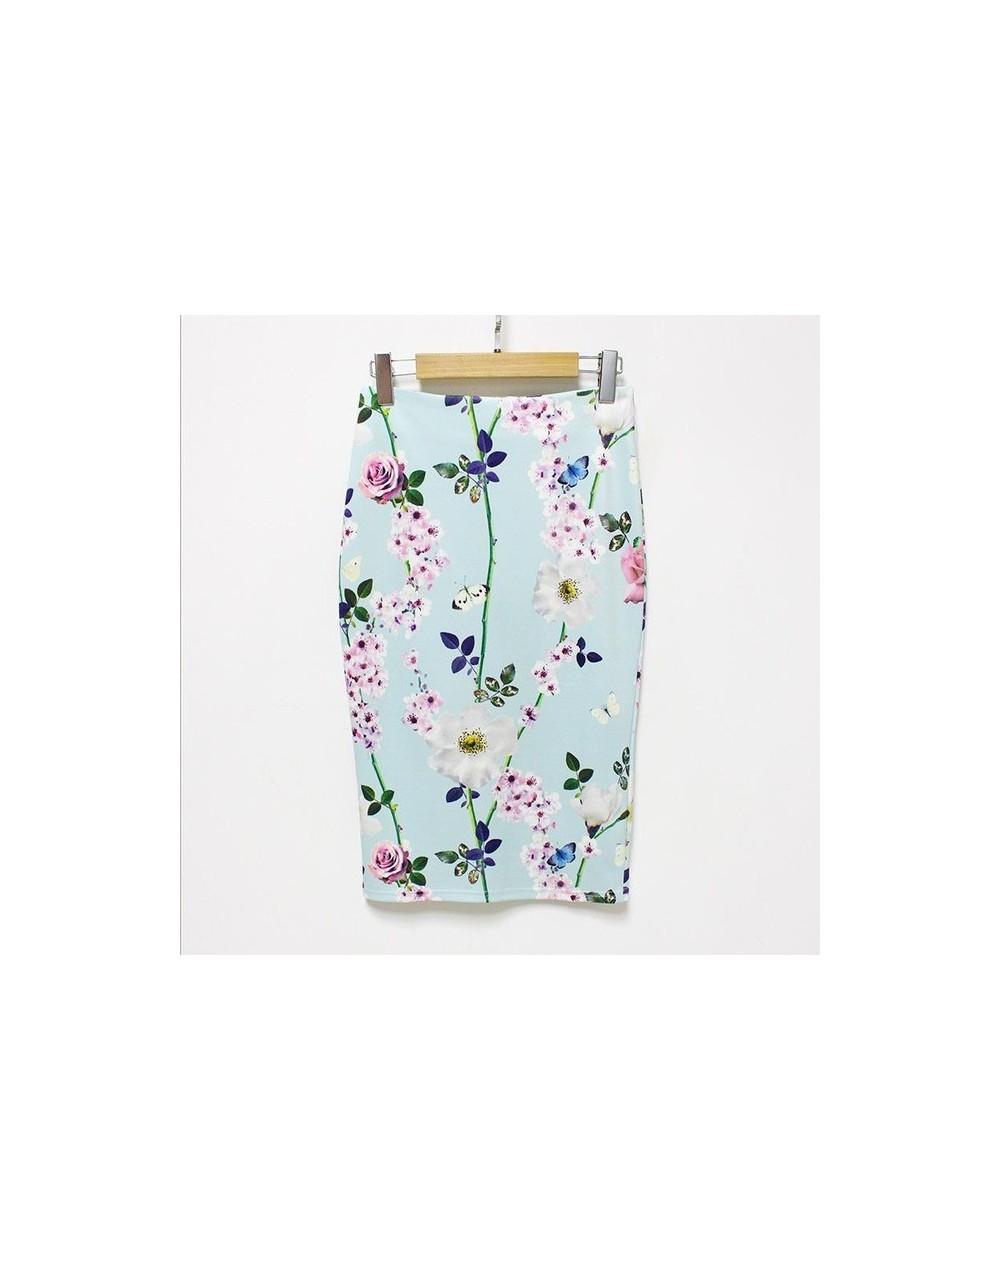 2018 New Arrival Sexy & Club Floral Pencil Skirt High Waist Vintage Bodycon Mini Skirt Women Black Skirt - 113 - 4B3971666534-6